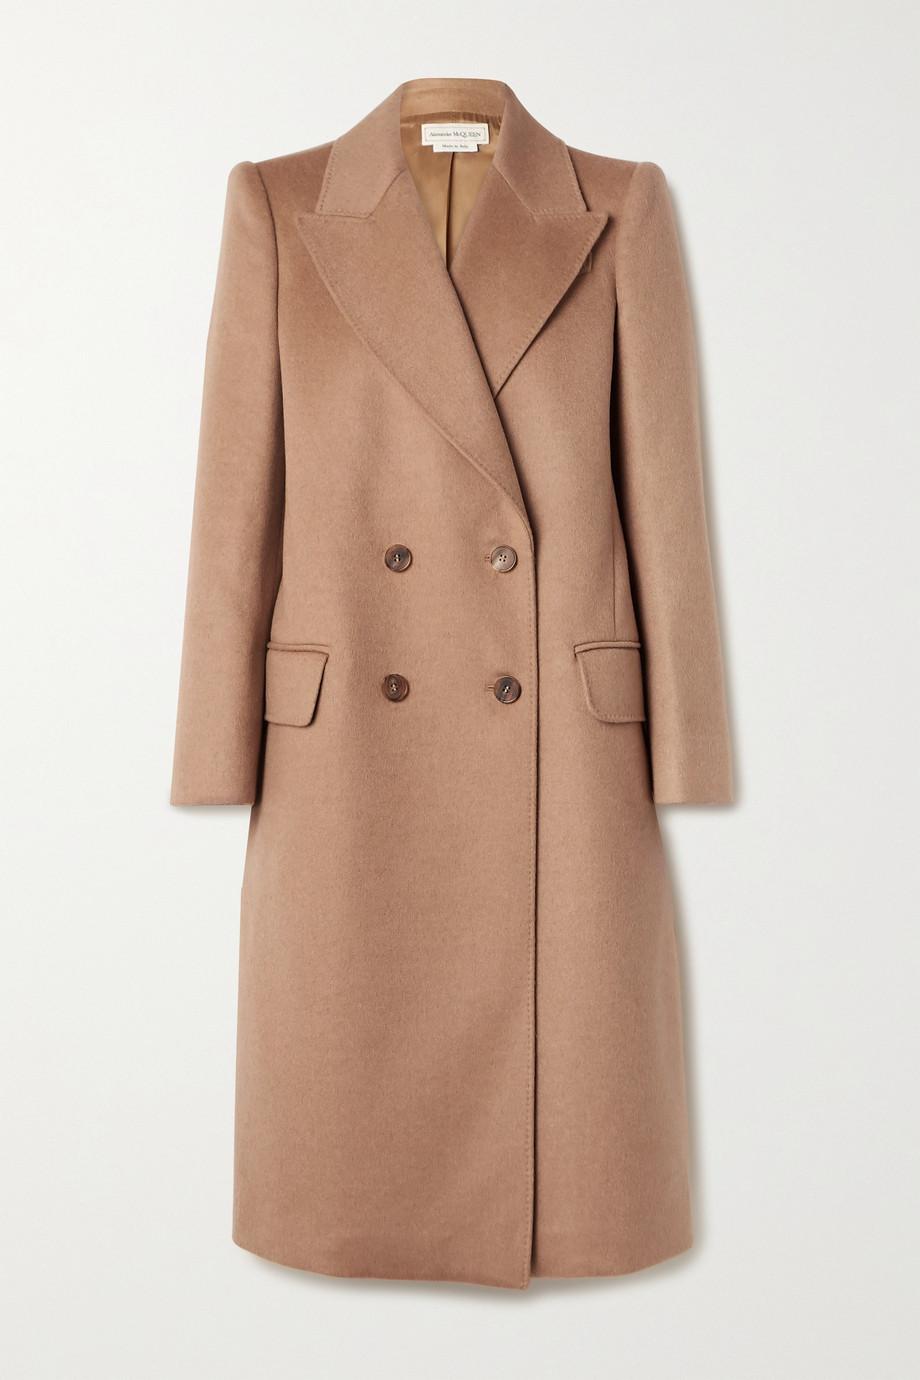 Alexander McQueen Double-breasted camel hair coat